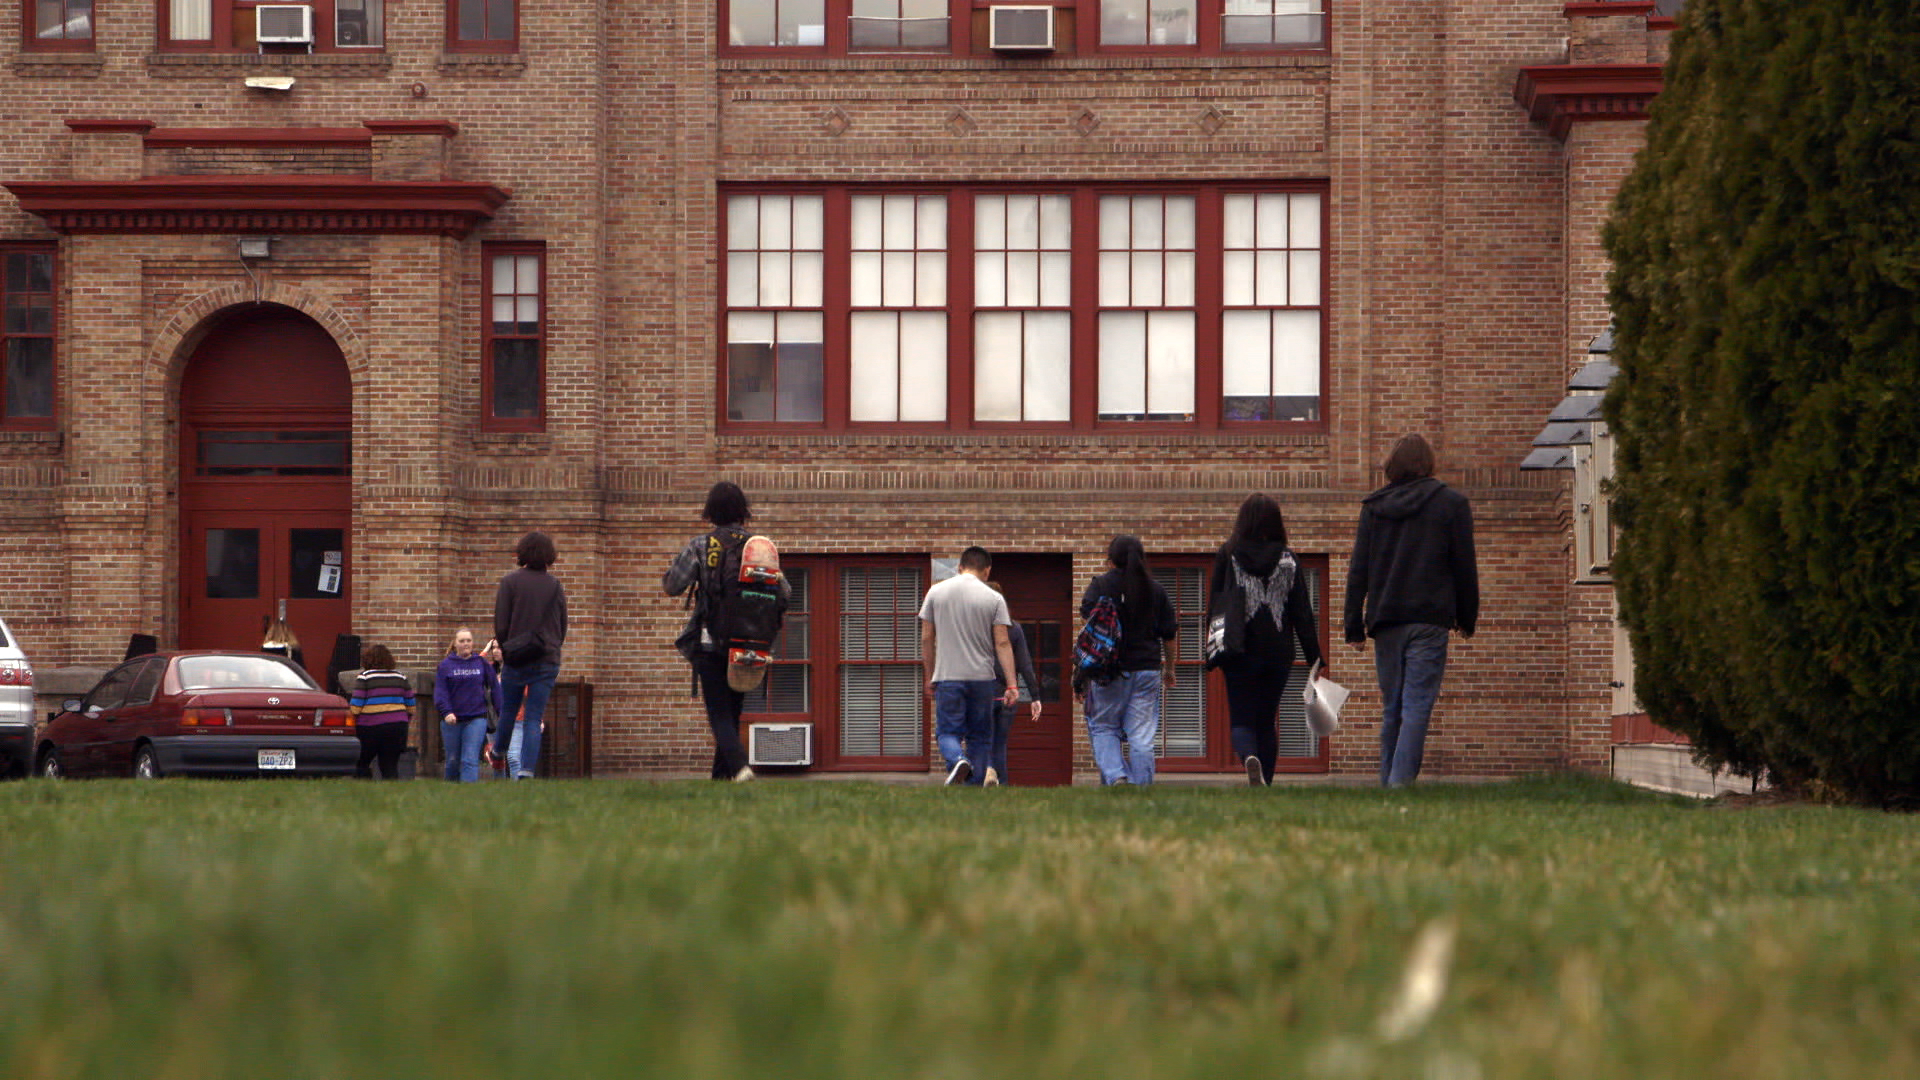 PT screencap - Lincoln High School exterior kids walking in.jpg